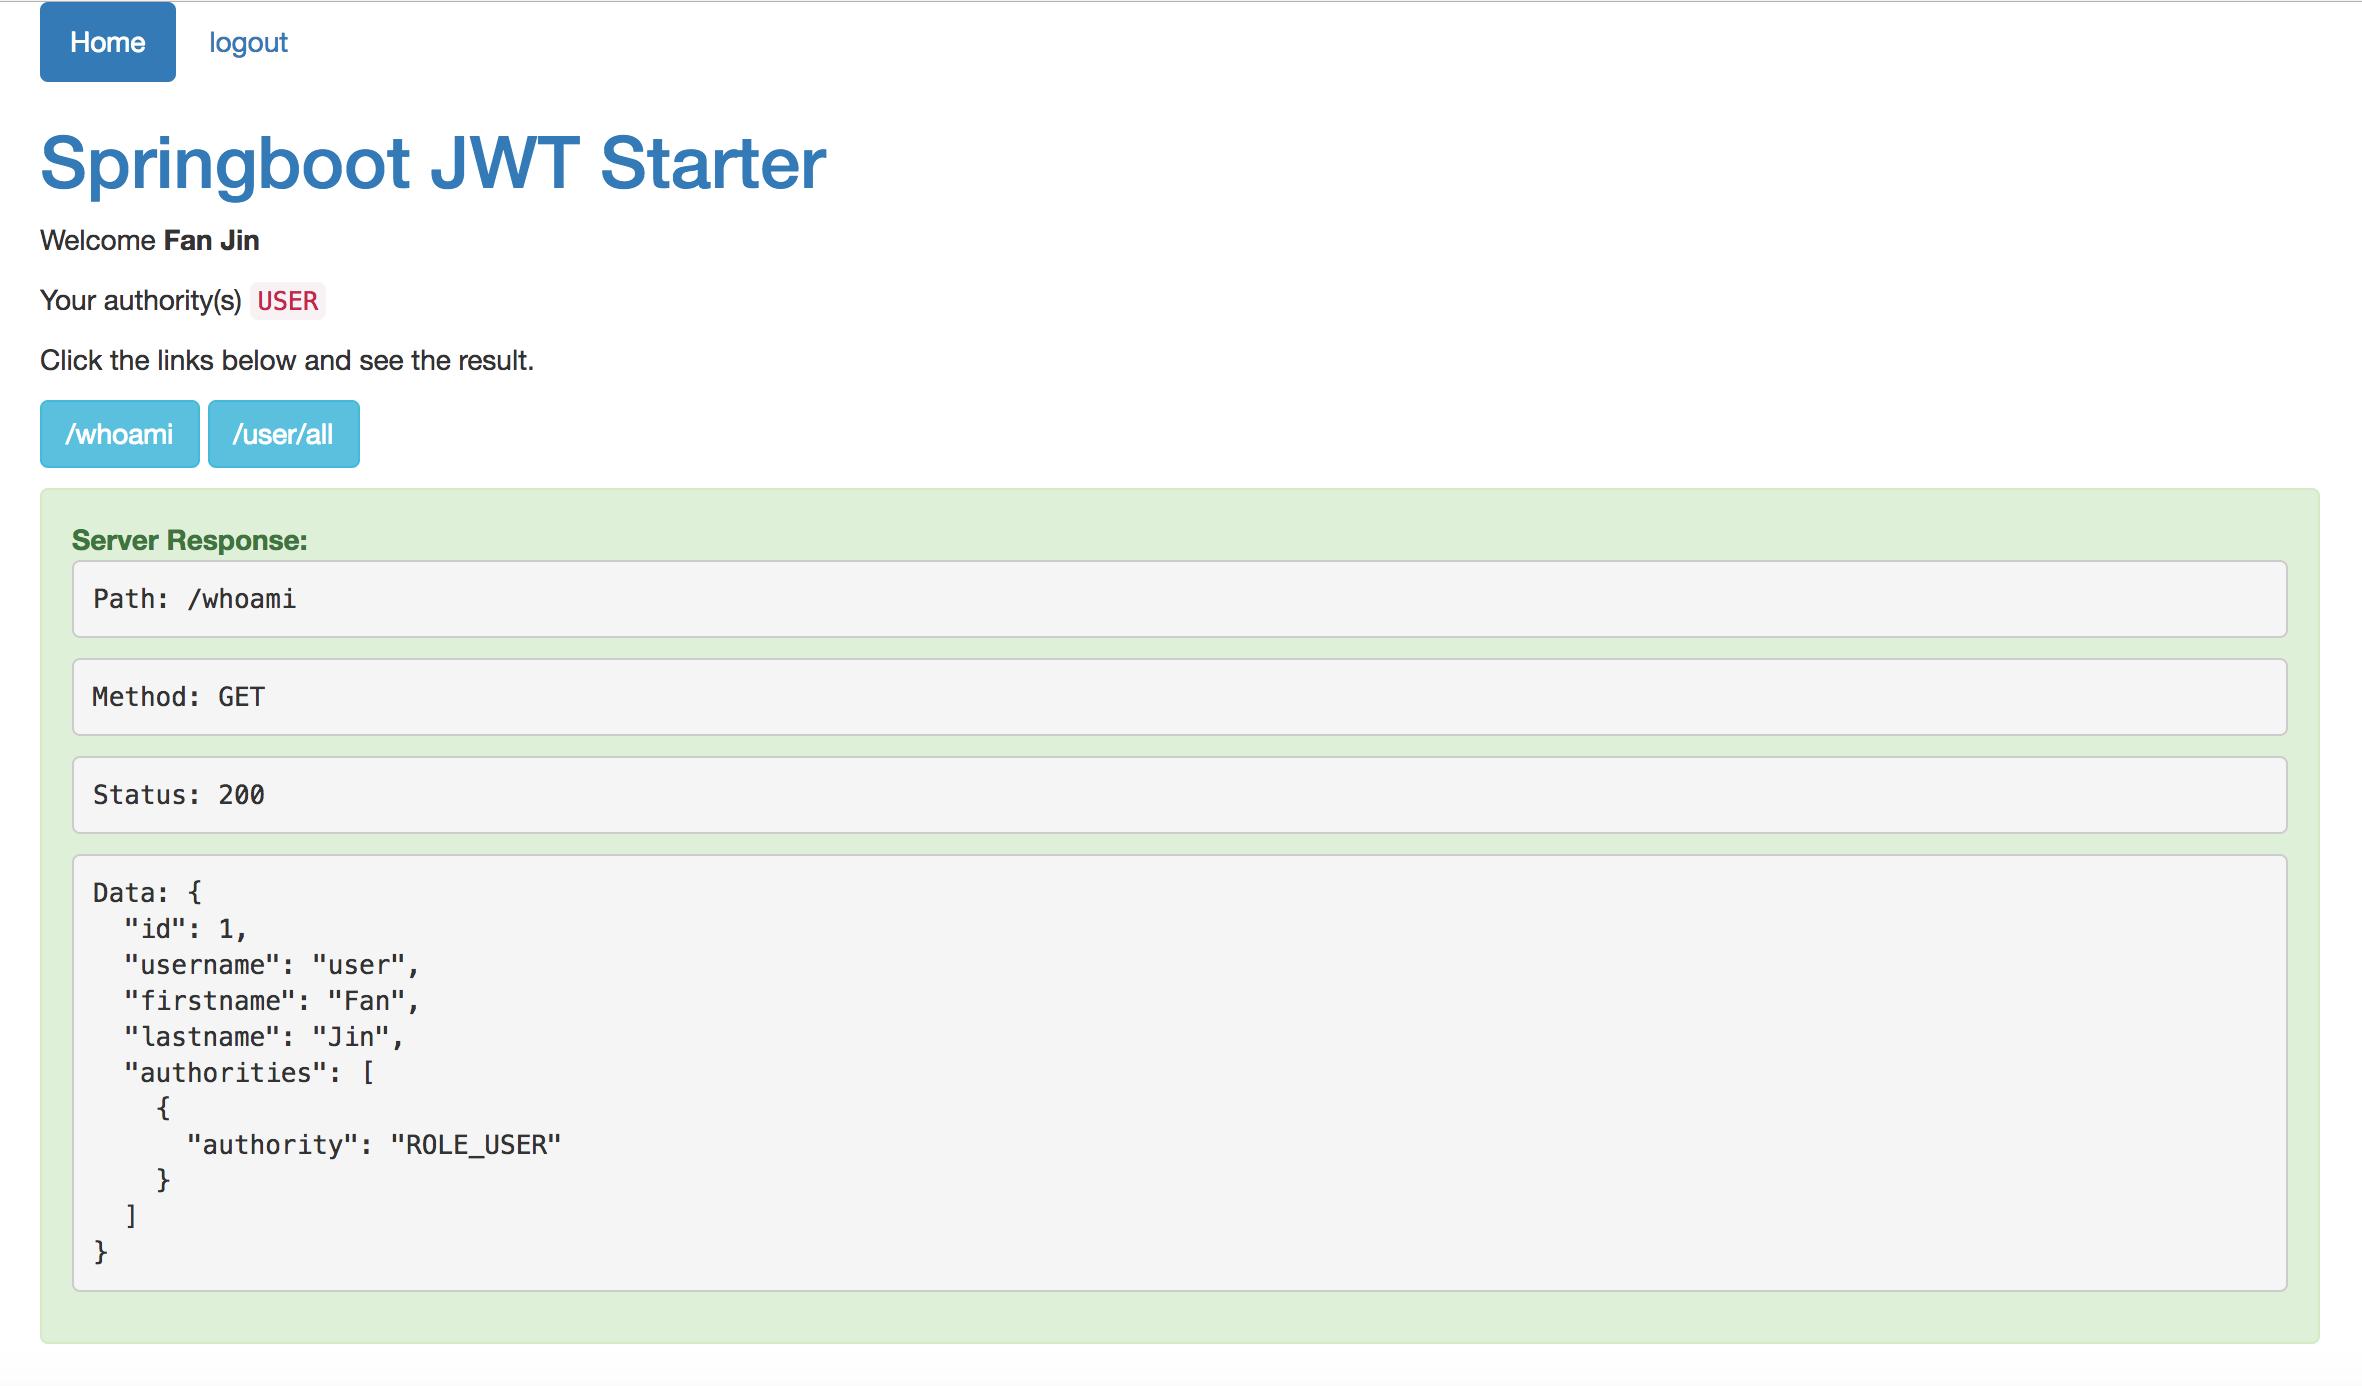 Springboot JWT Starter